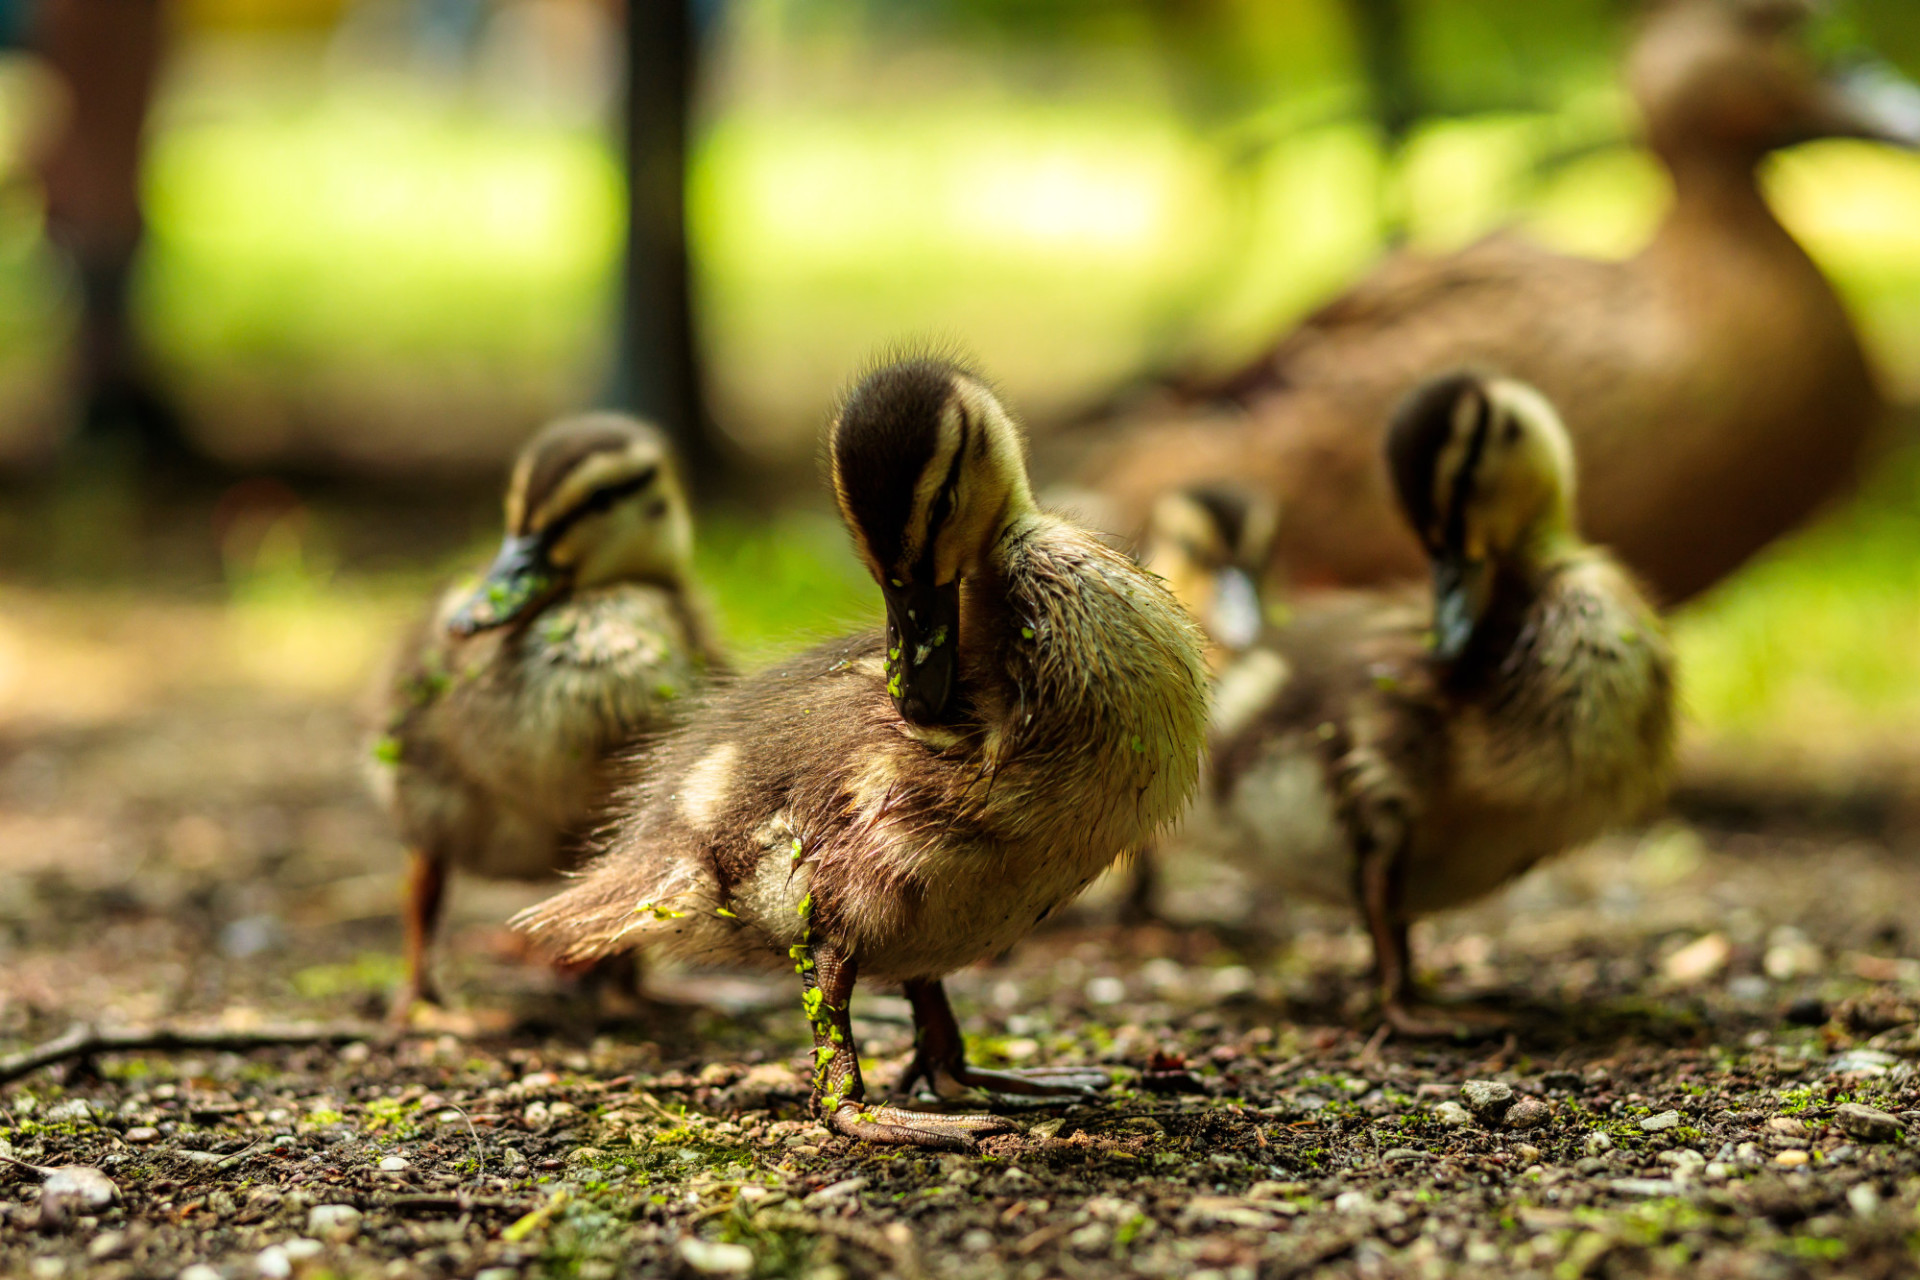 Cute little duckling preening its feathers